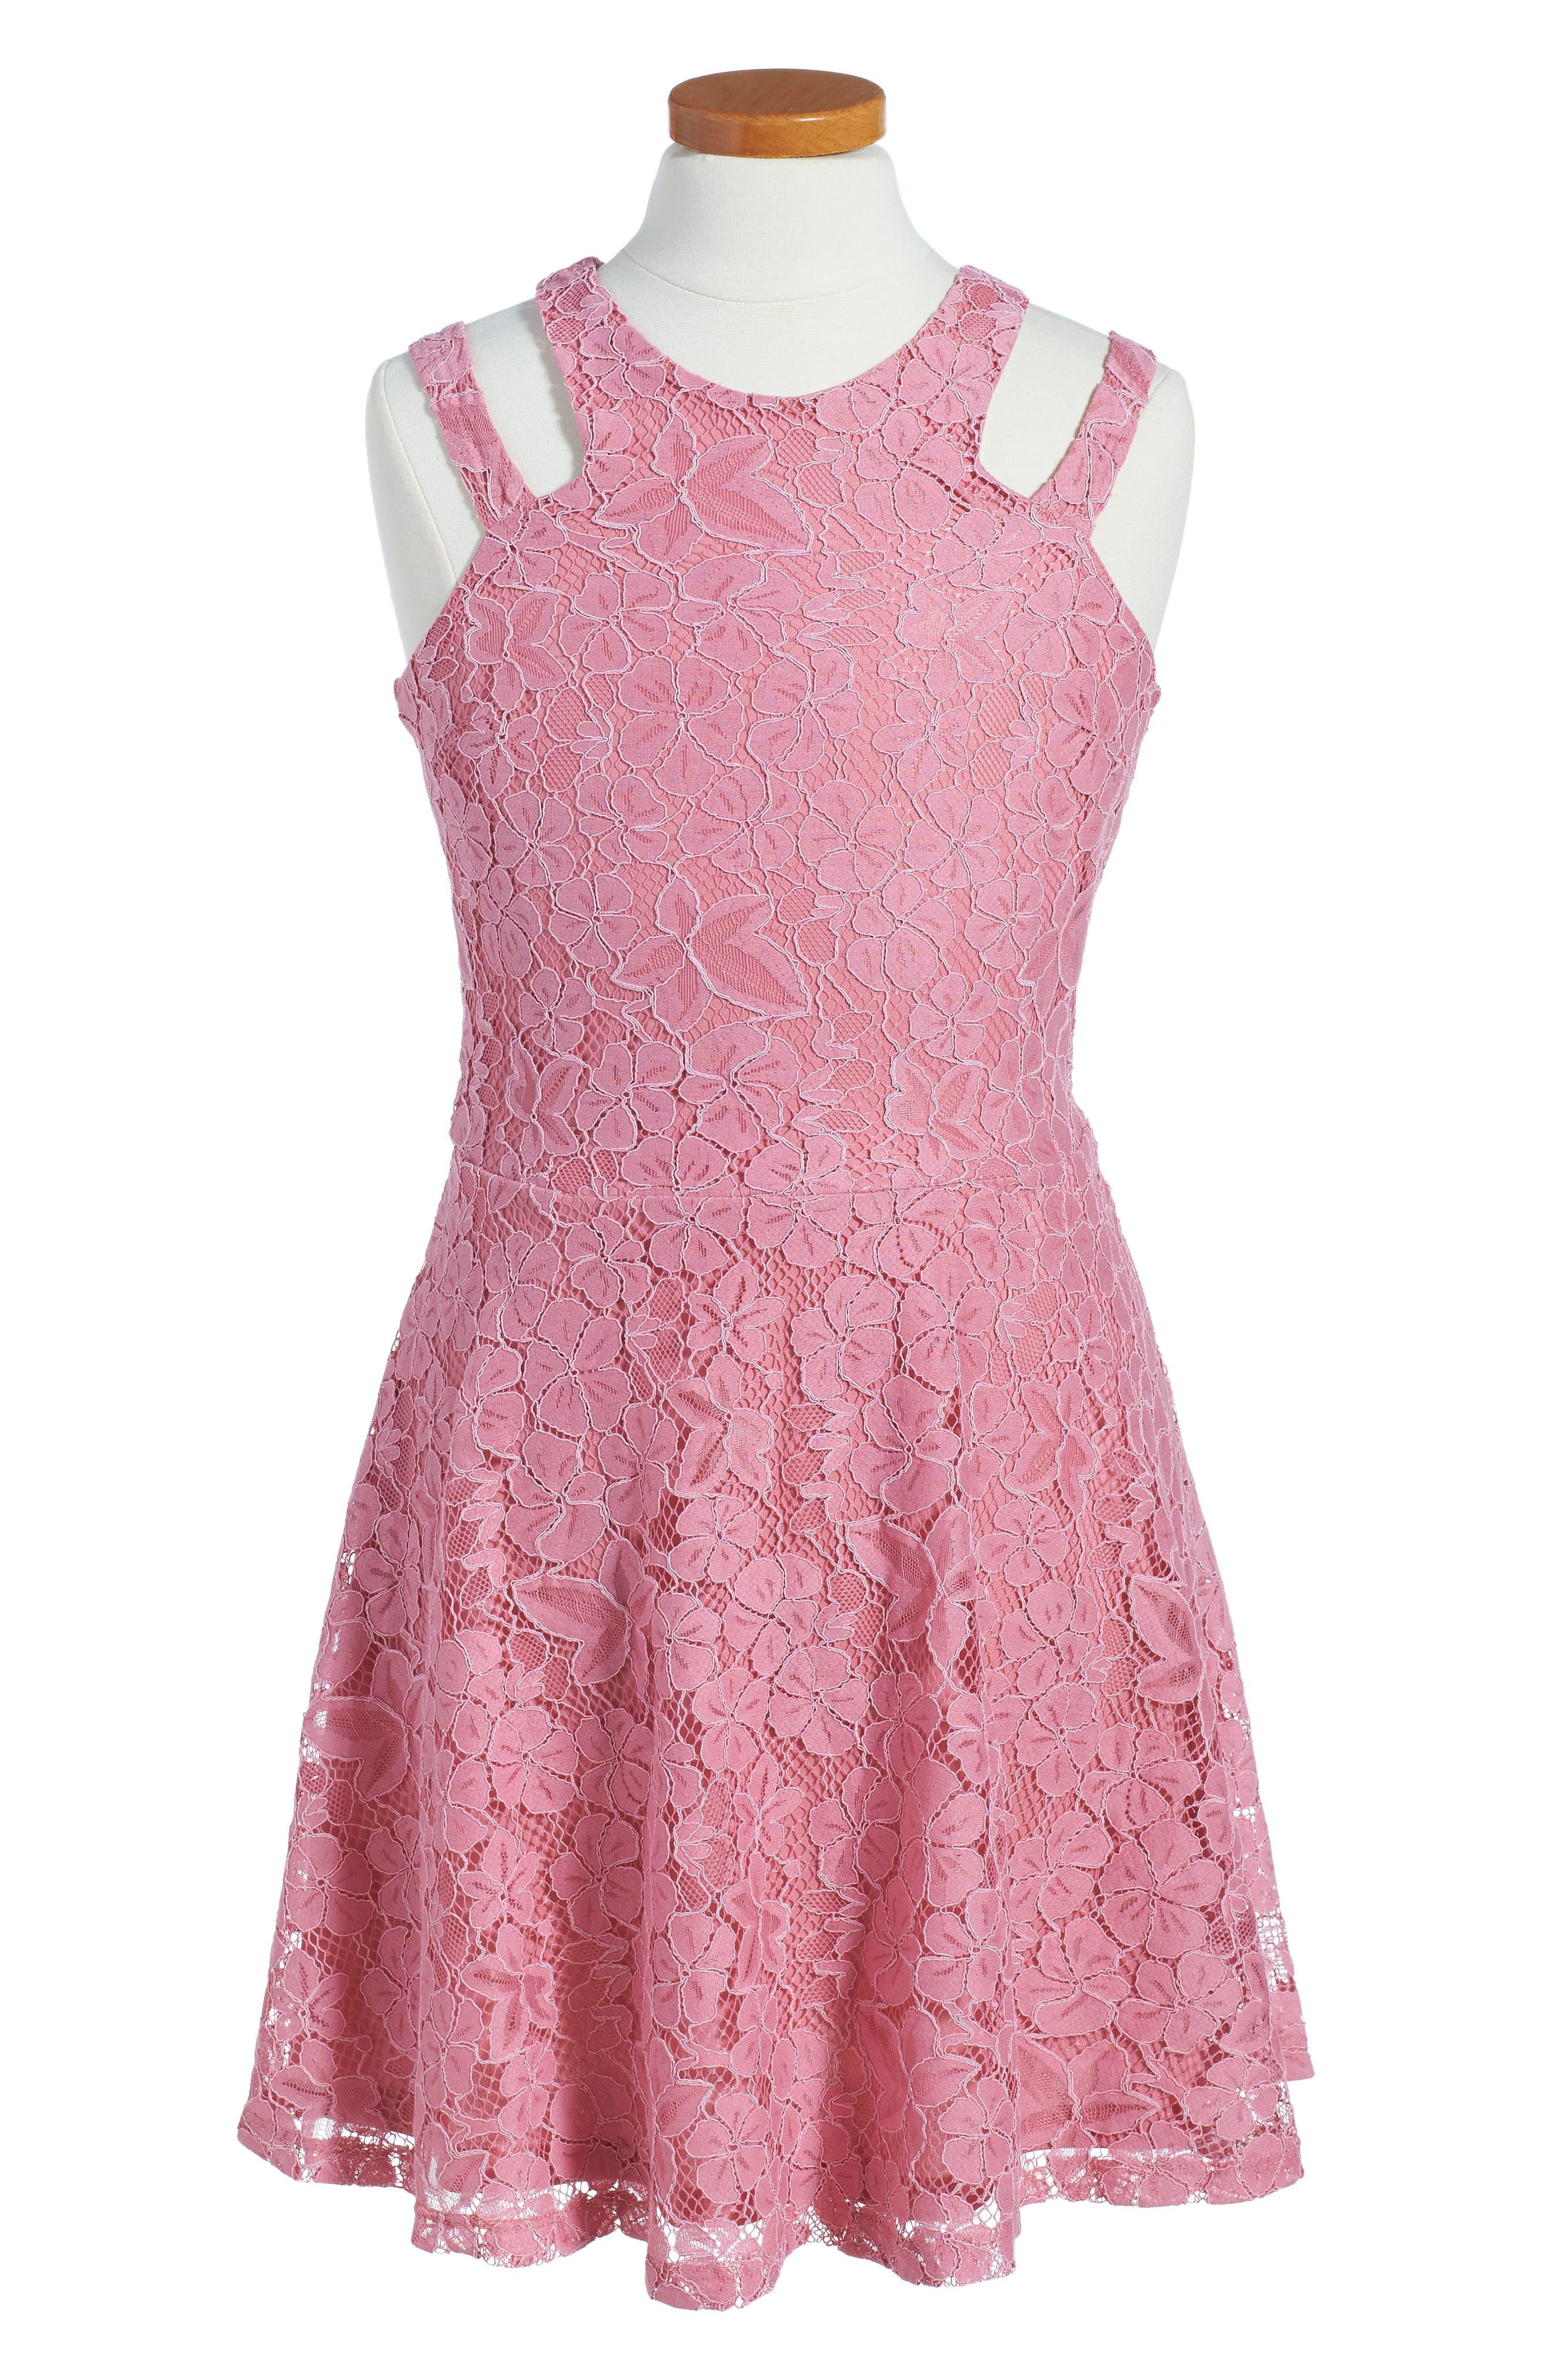 PENELOPE TREE Lace Sleeveless Dress